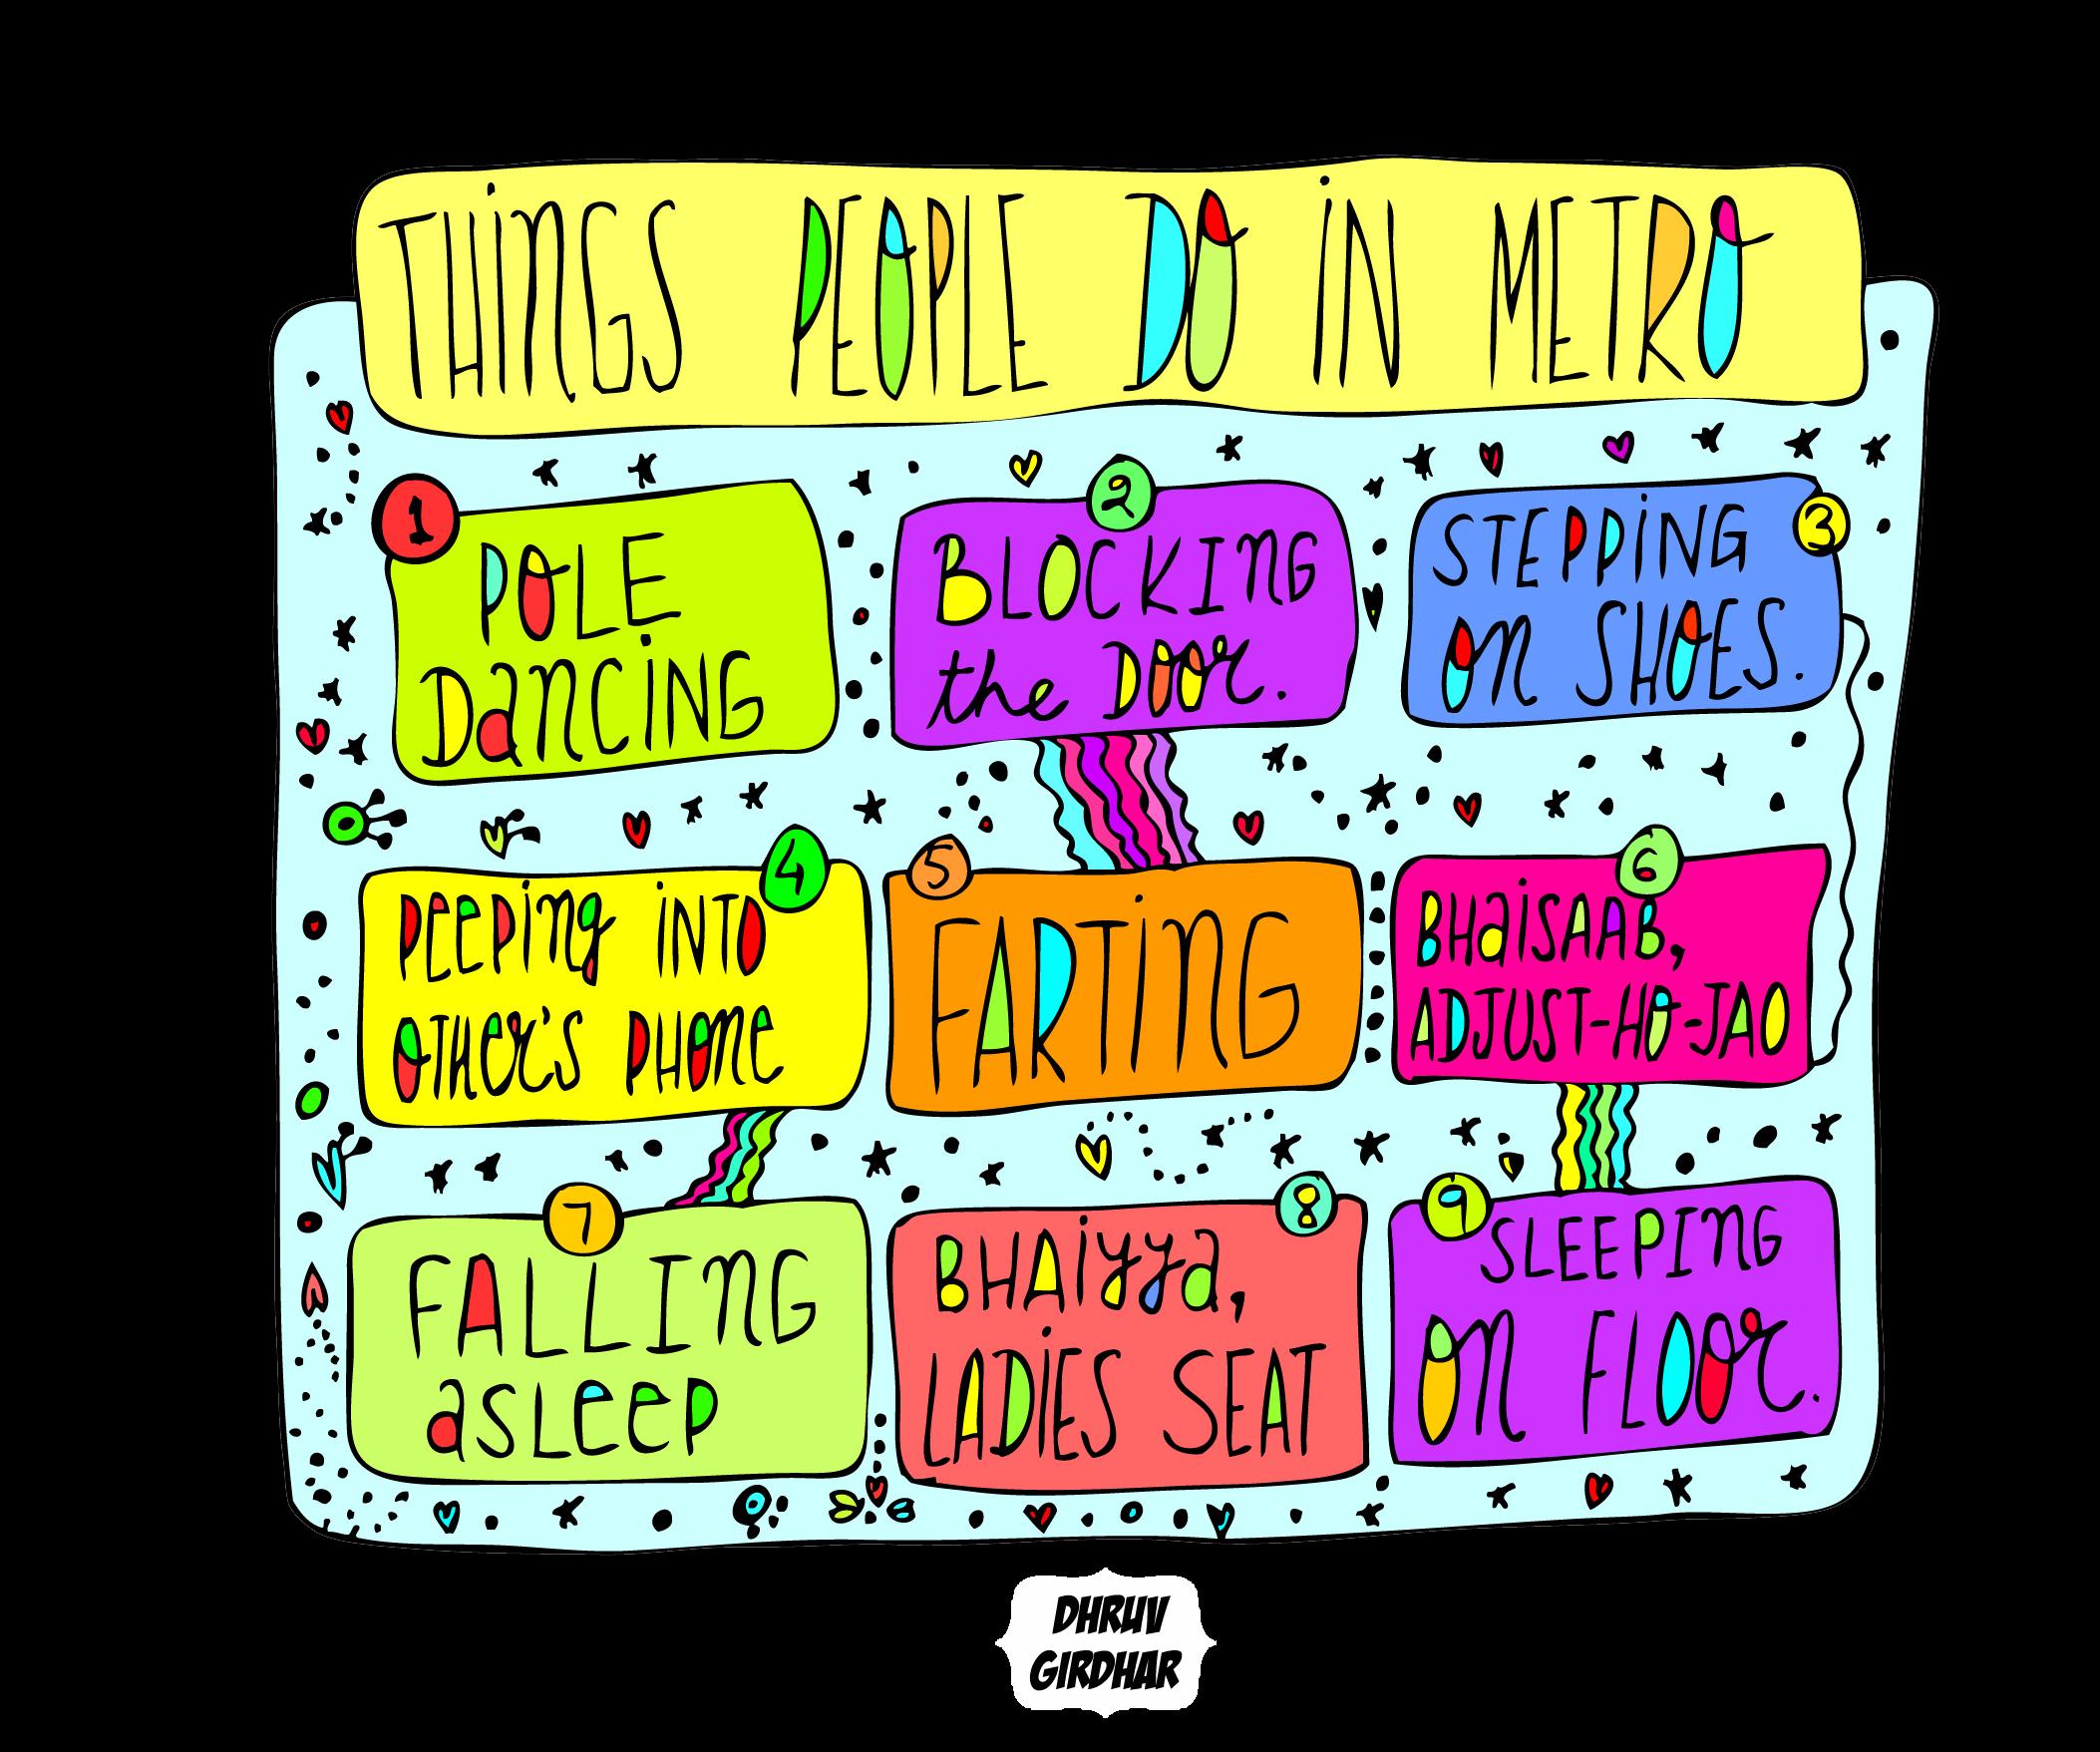 Annoying Things People Do In Delhi Metro